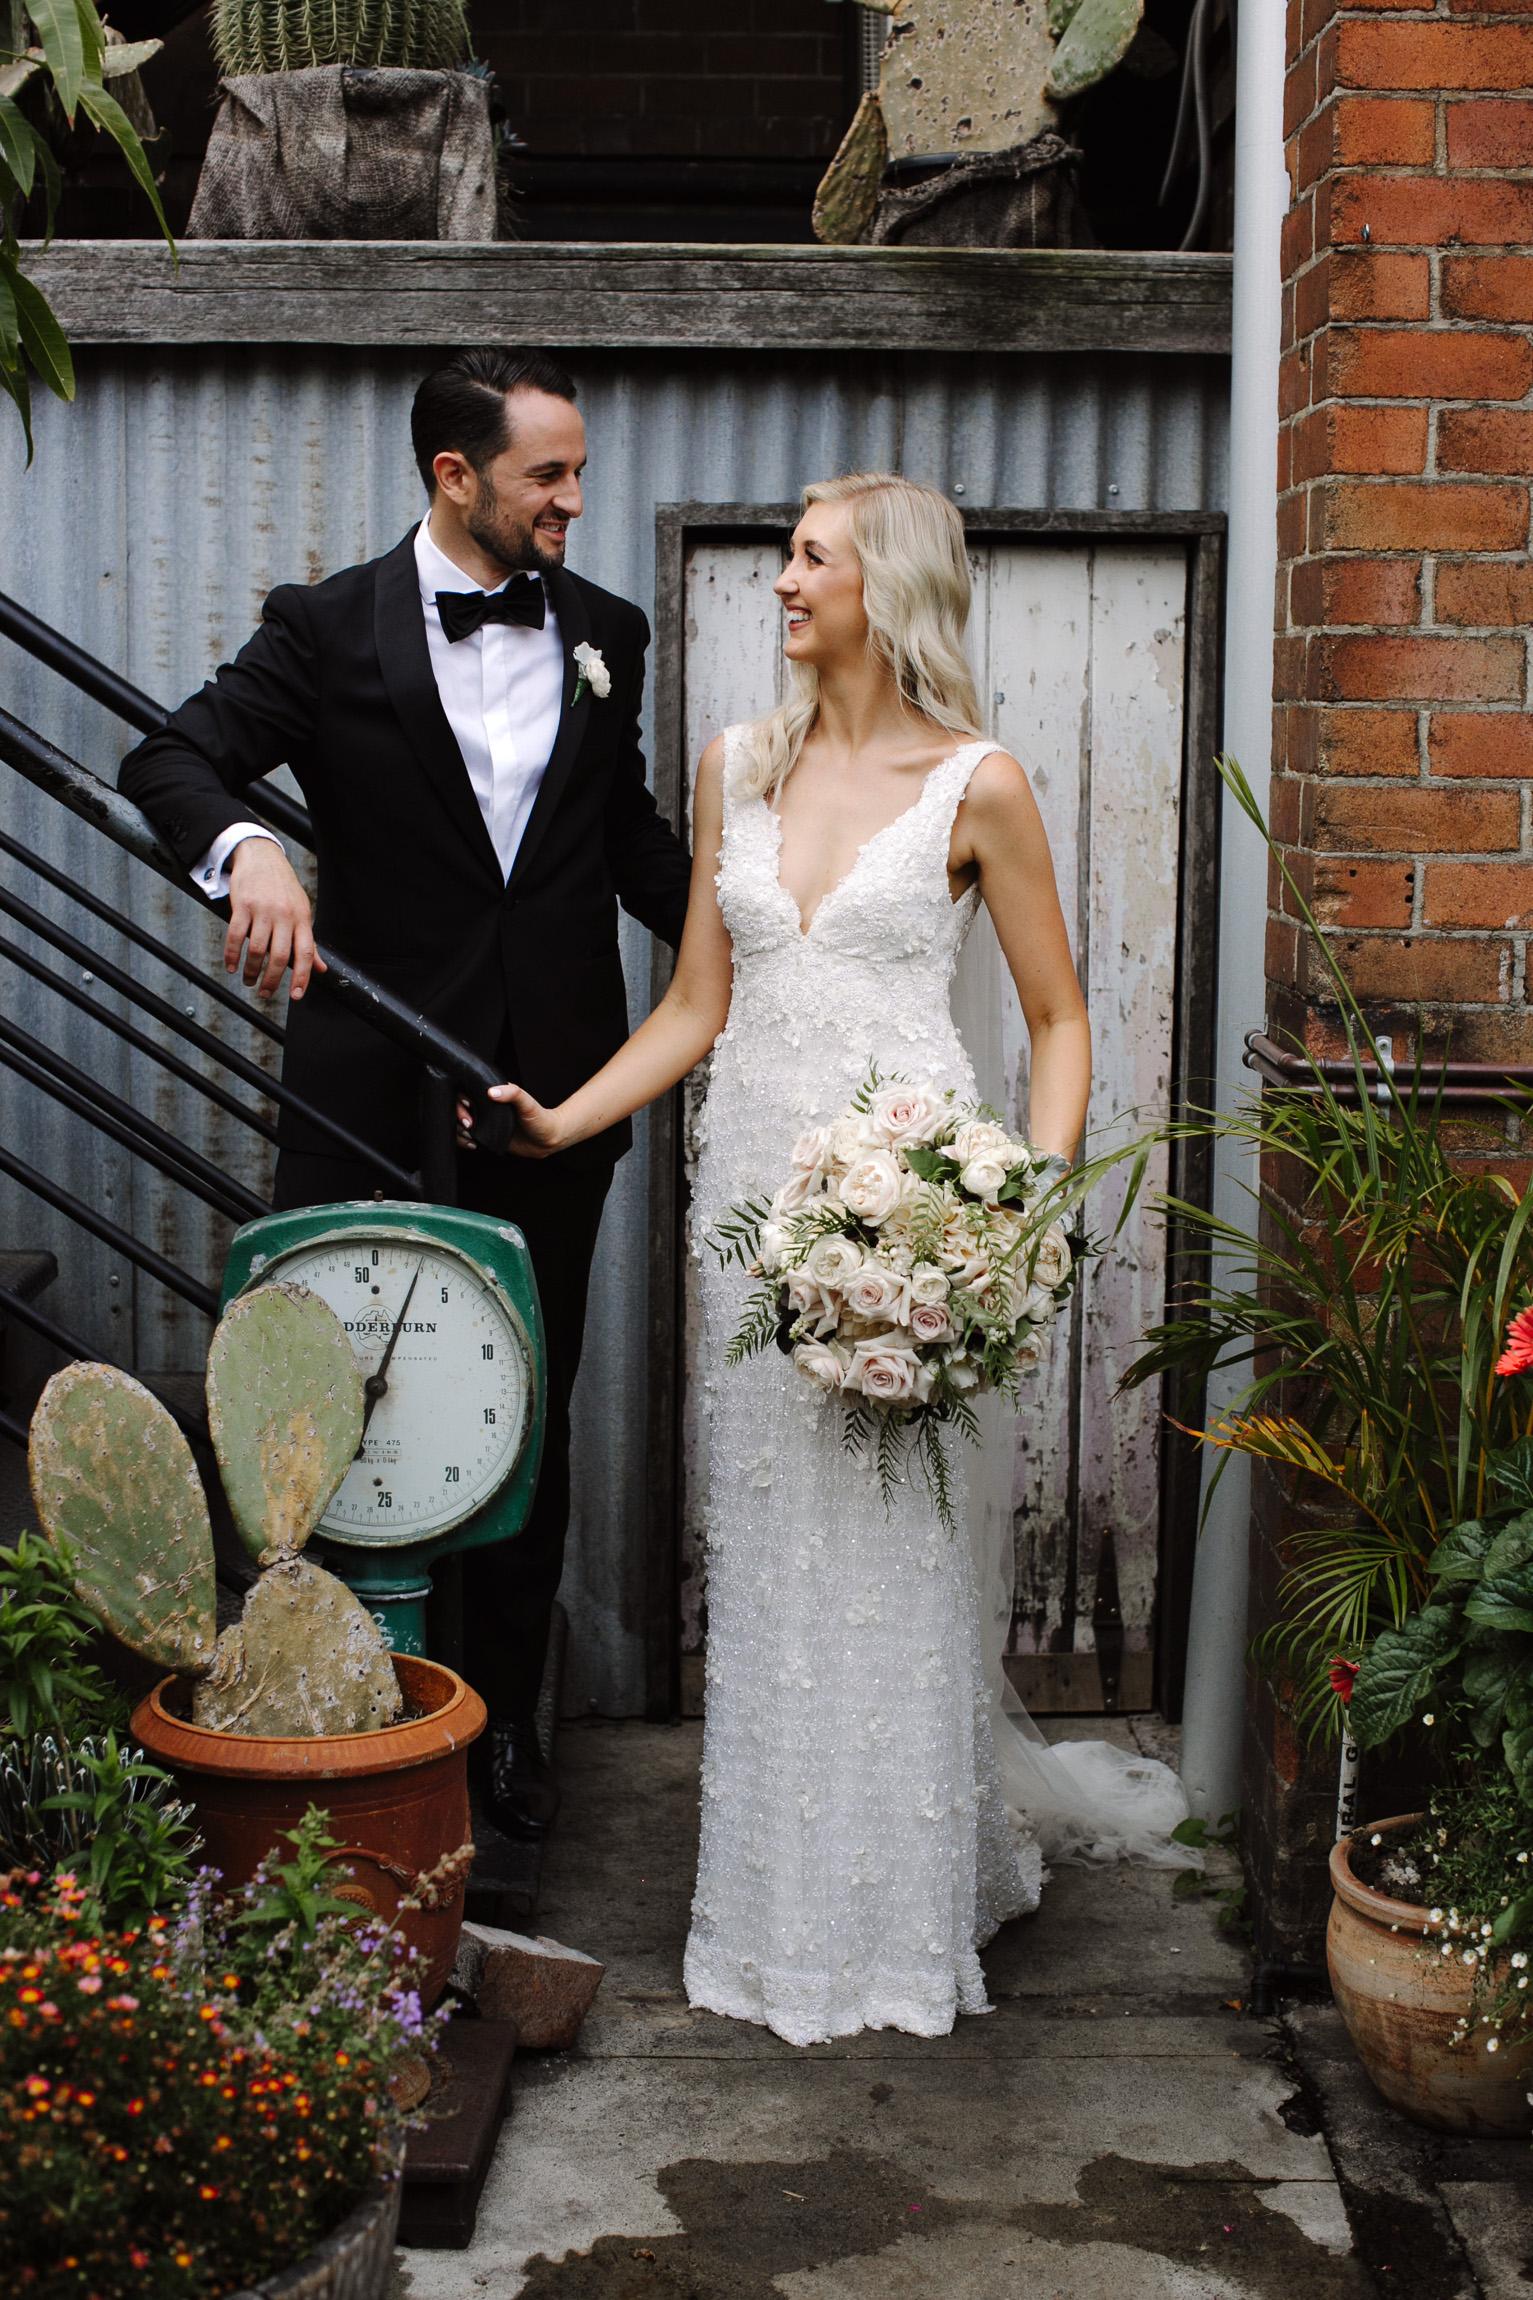 180223_justinaaron_wedding_charlotte_david_h-160.jpg